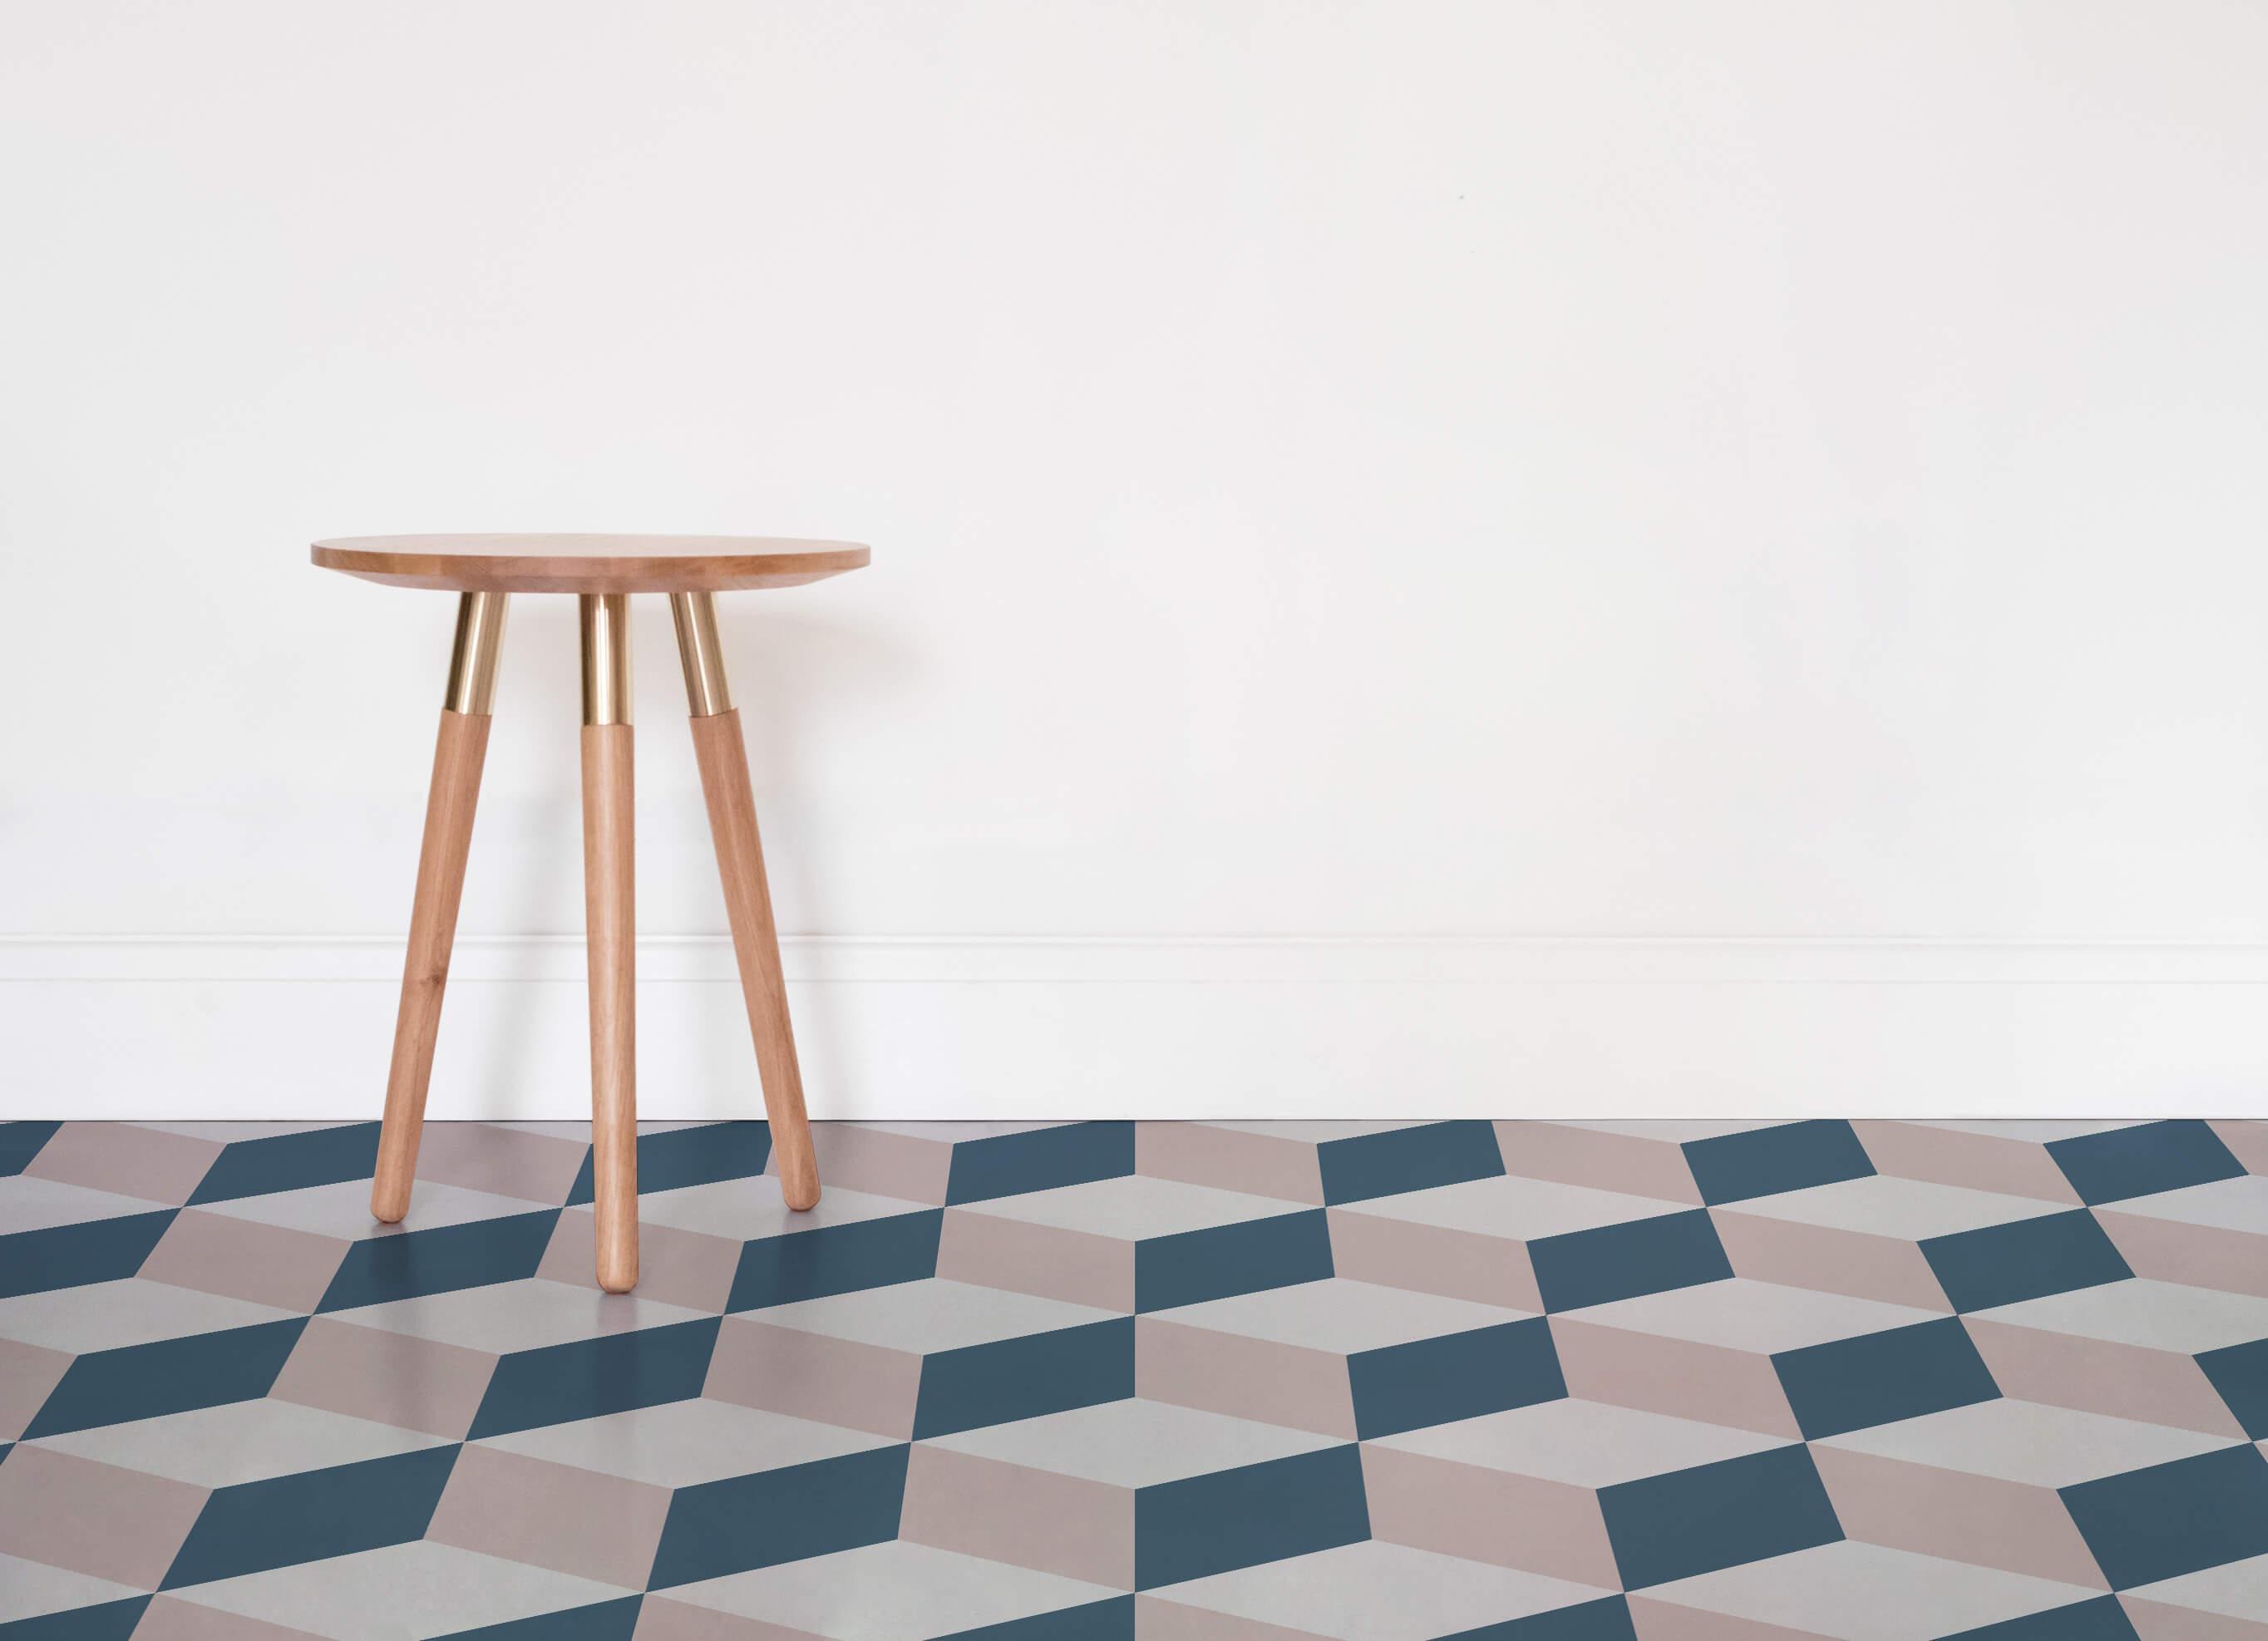 vinyl floor cube-geometric-vinyl-flooring-pink-room-vinyl-flooring SXEVVCY